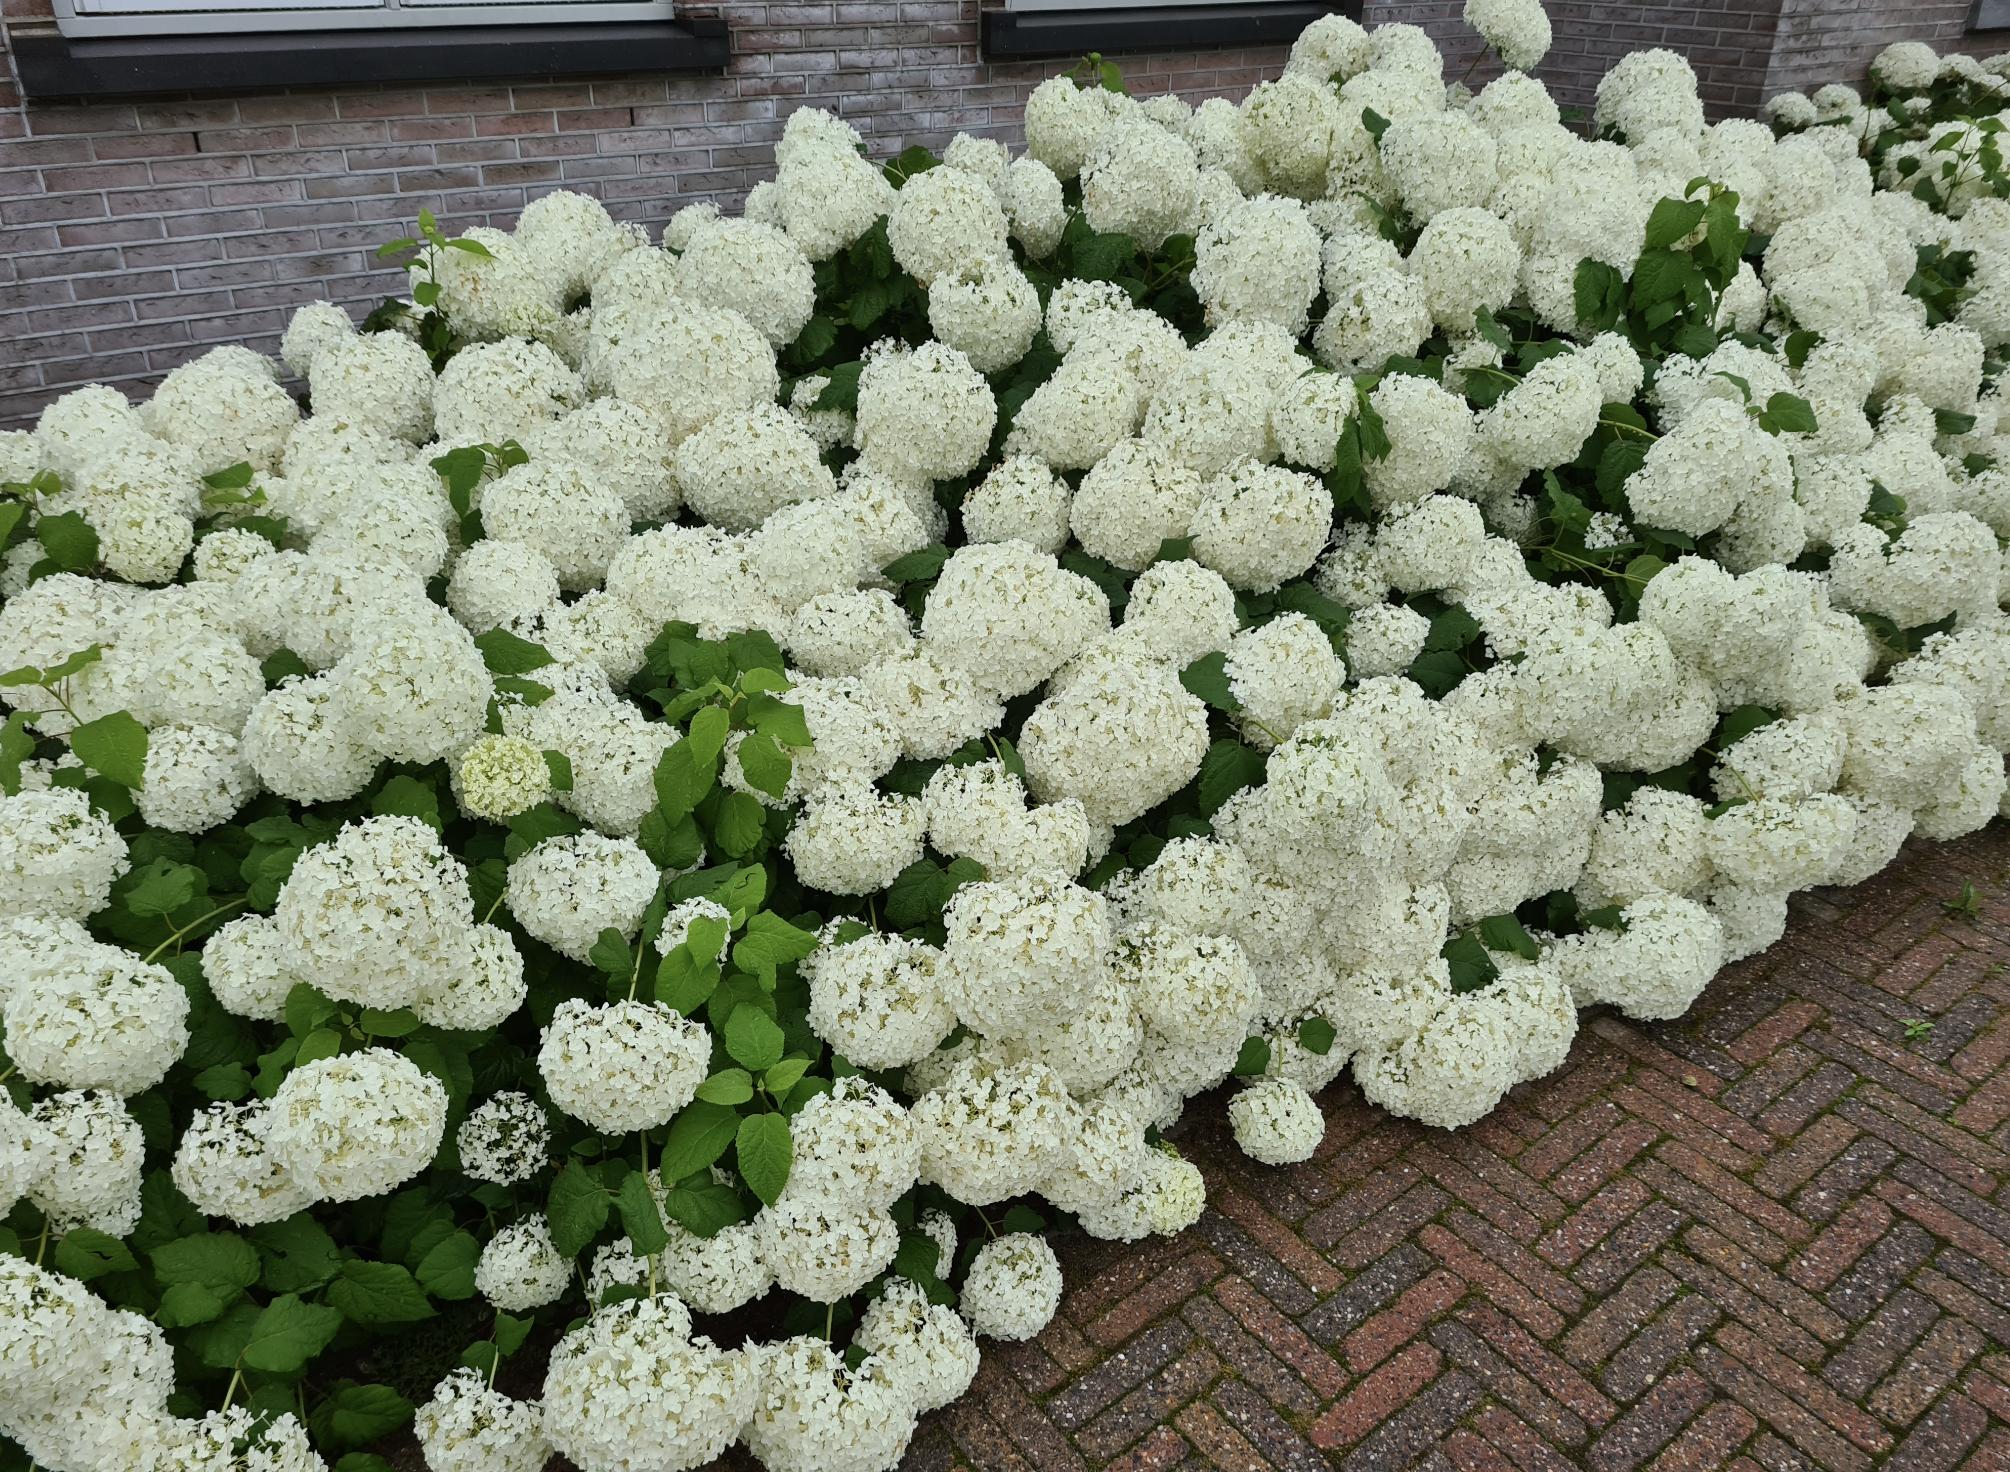 Hortensia annabelle tuinplanten borderpakketten heesters witte bloeikleur